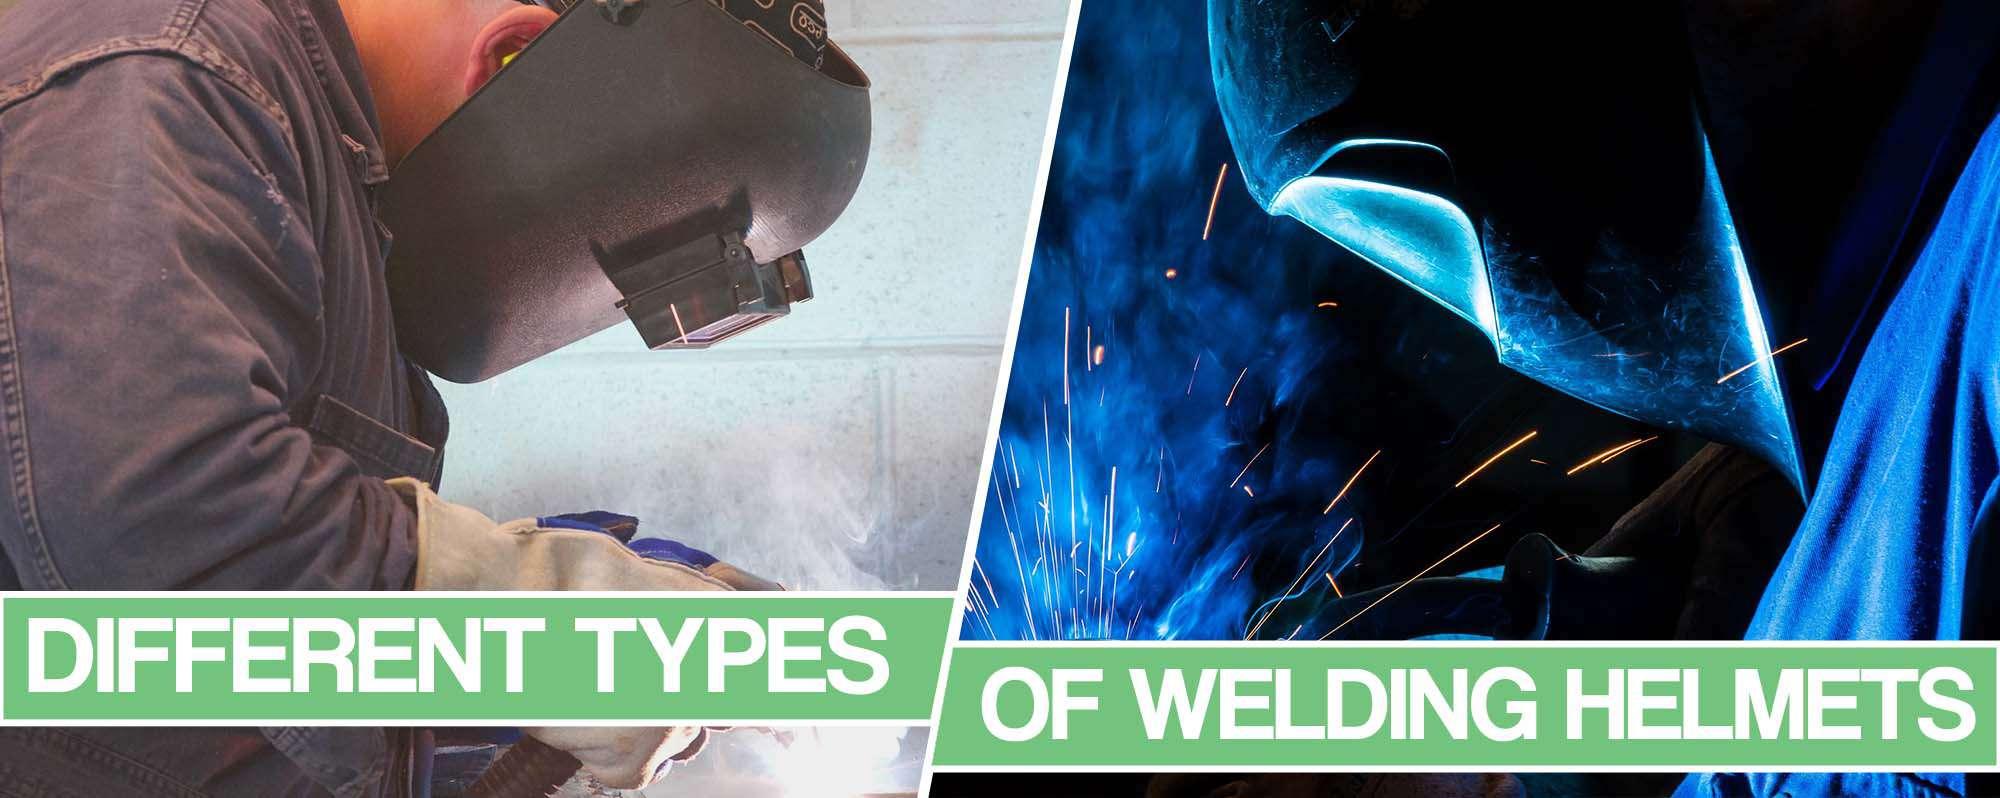 image of the different welding hoods